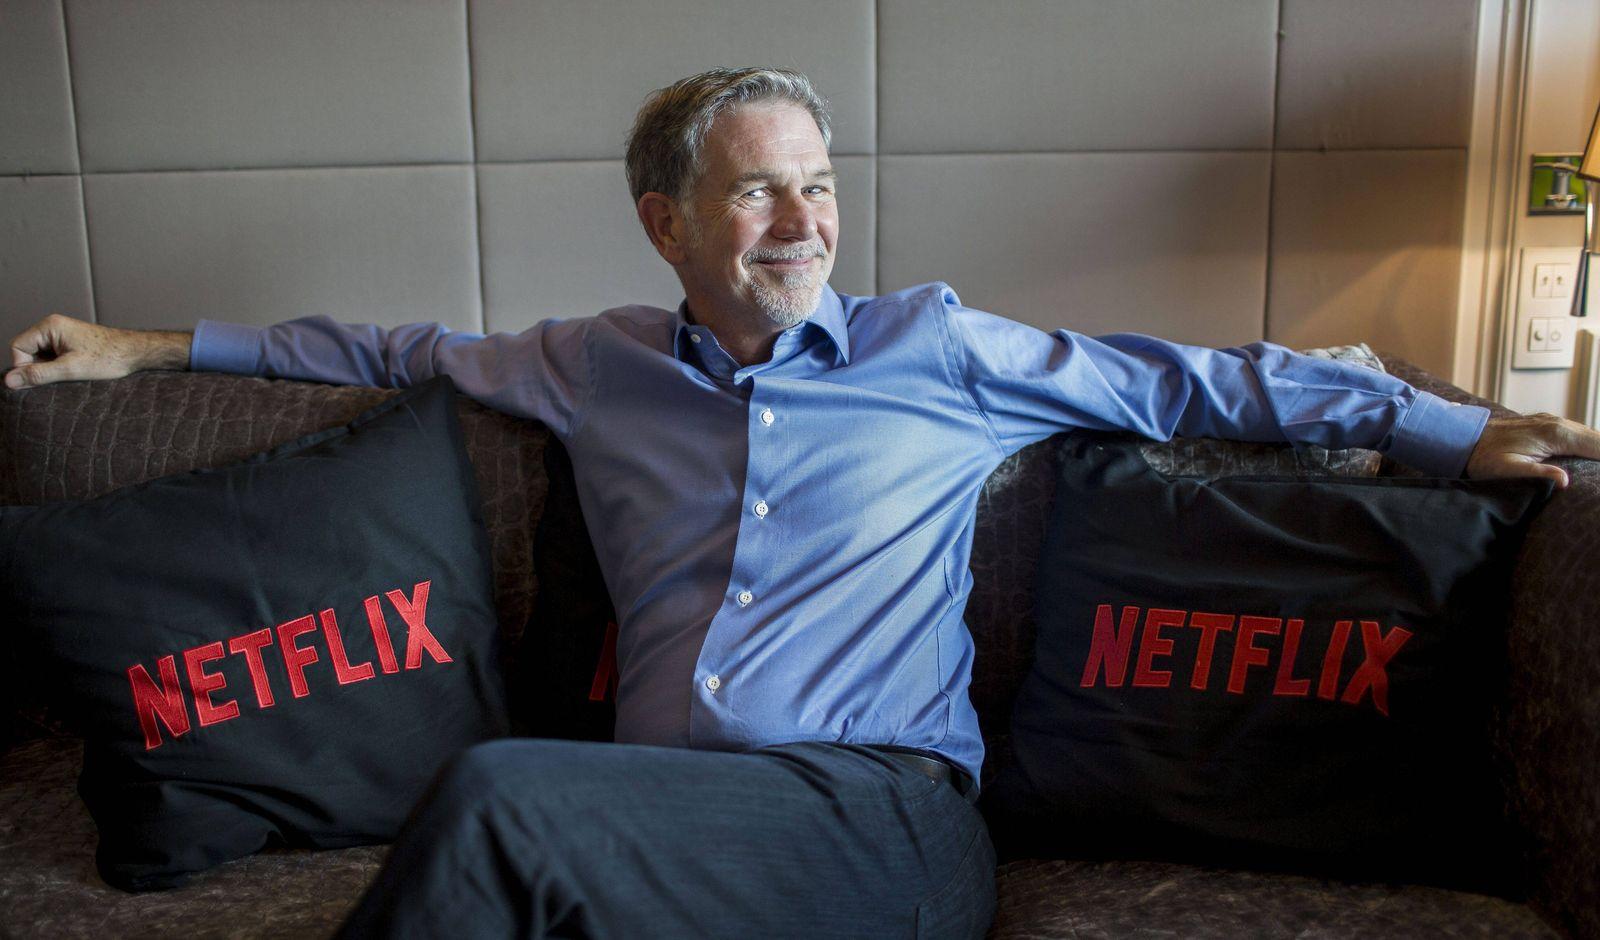 Co founder and director of Netflix Reed Hastings MADRID PUBLICATIONxINxGERxAUTxHUNxONLY SERGIOxGONZ